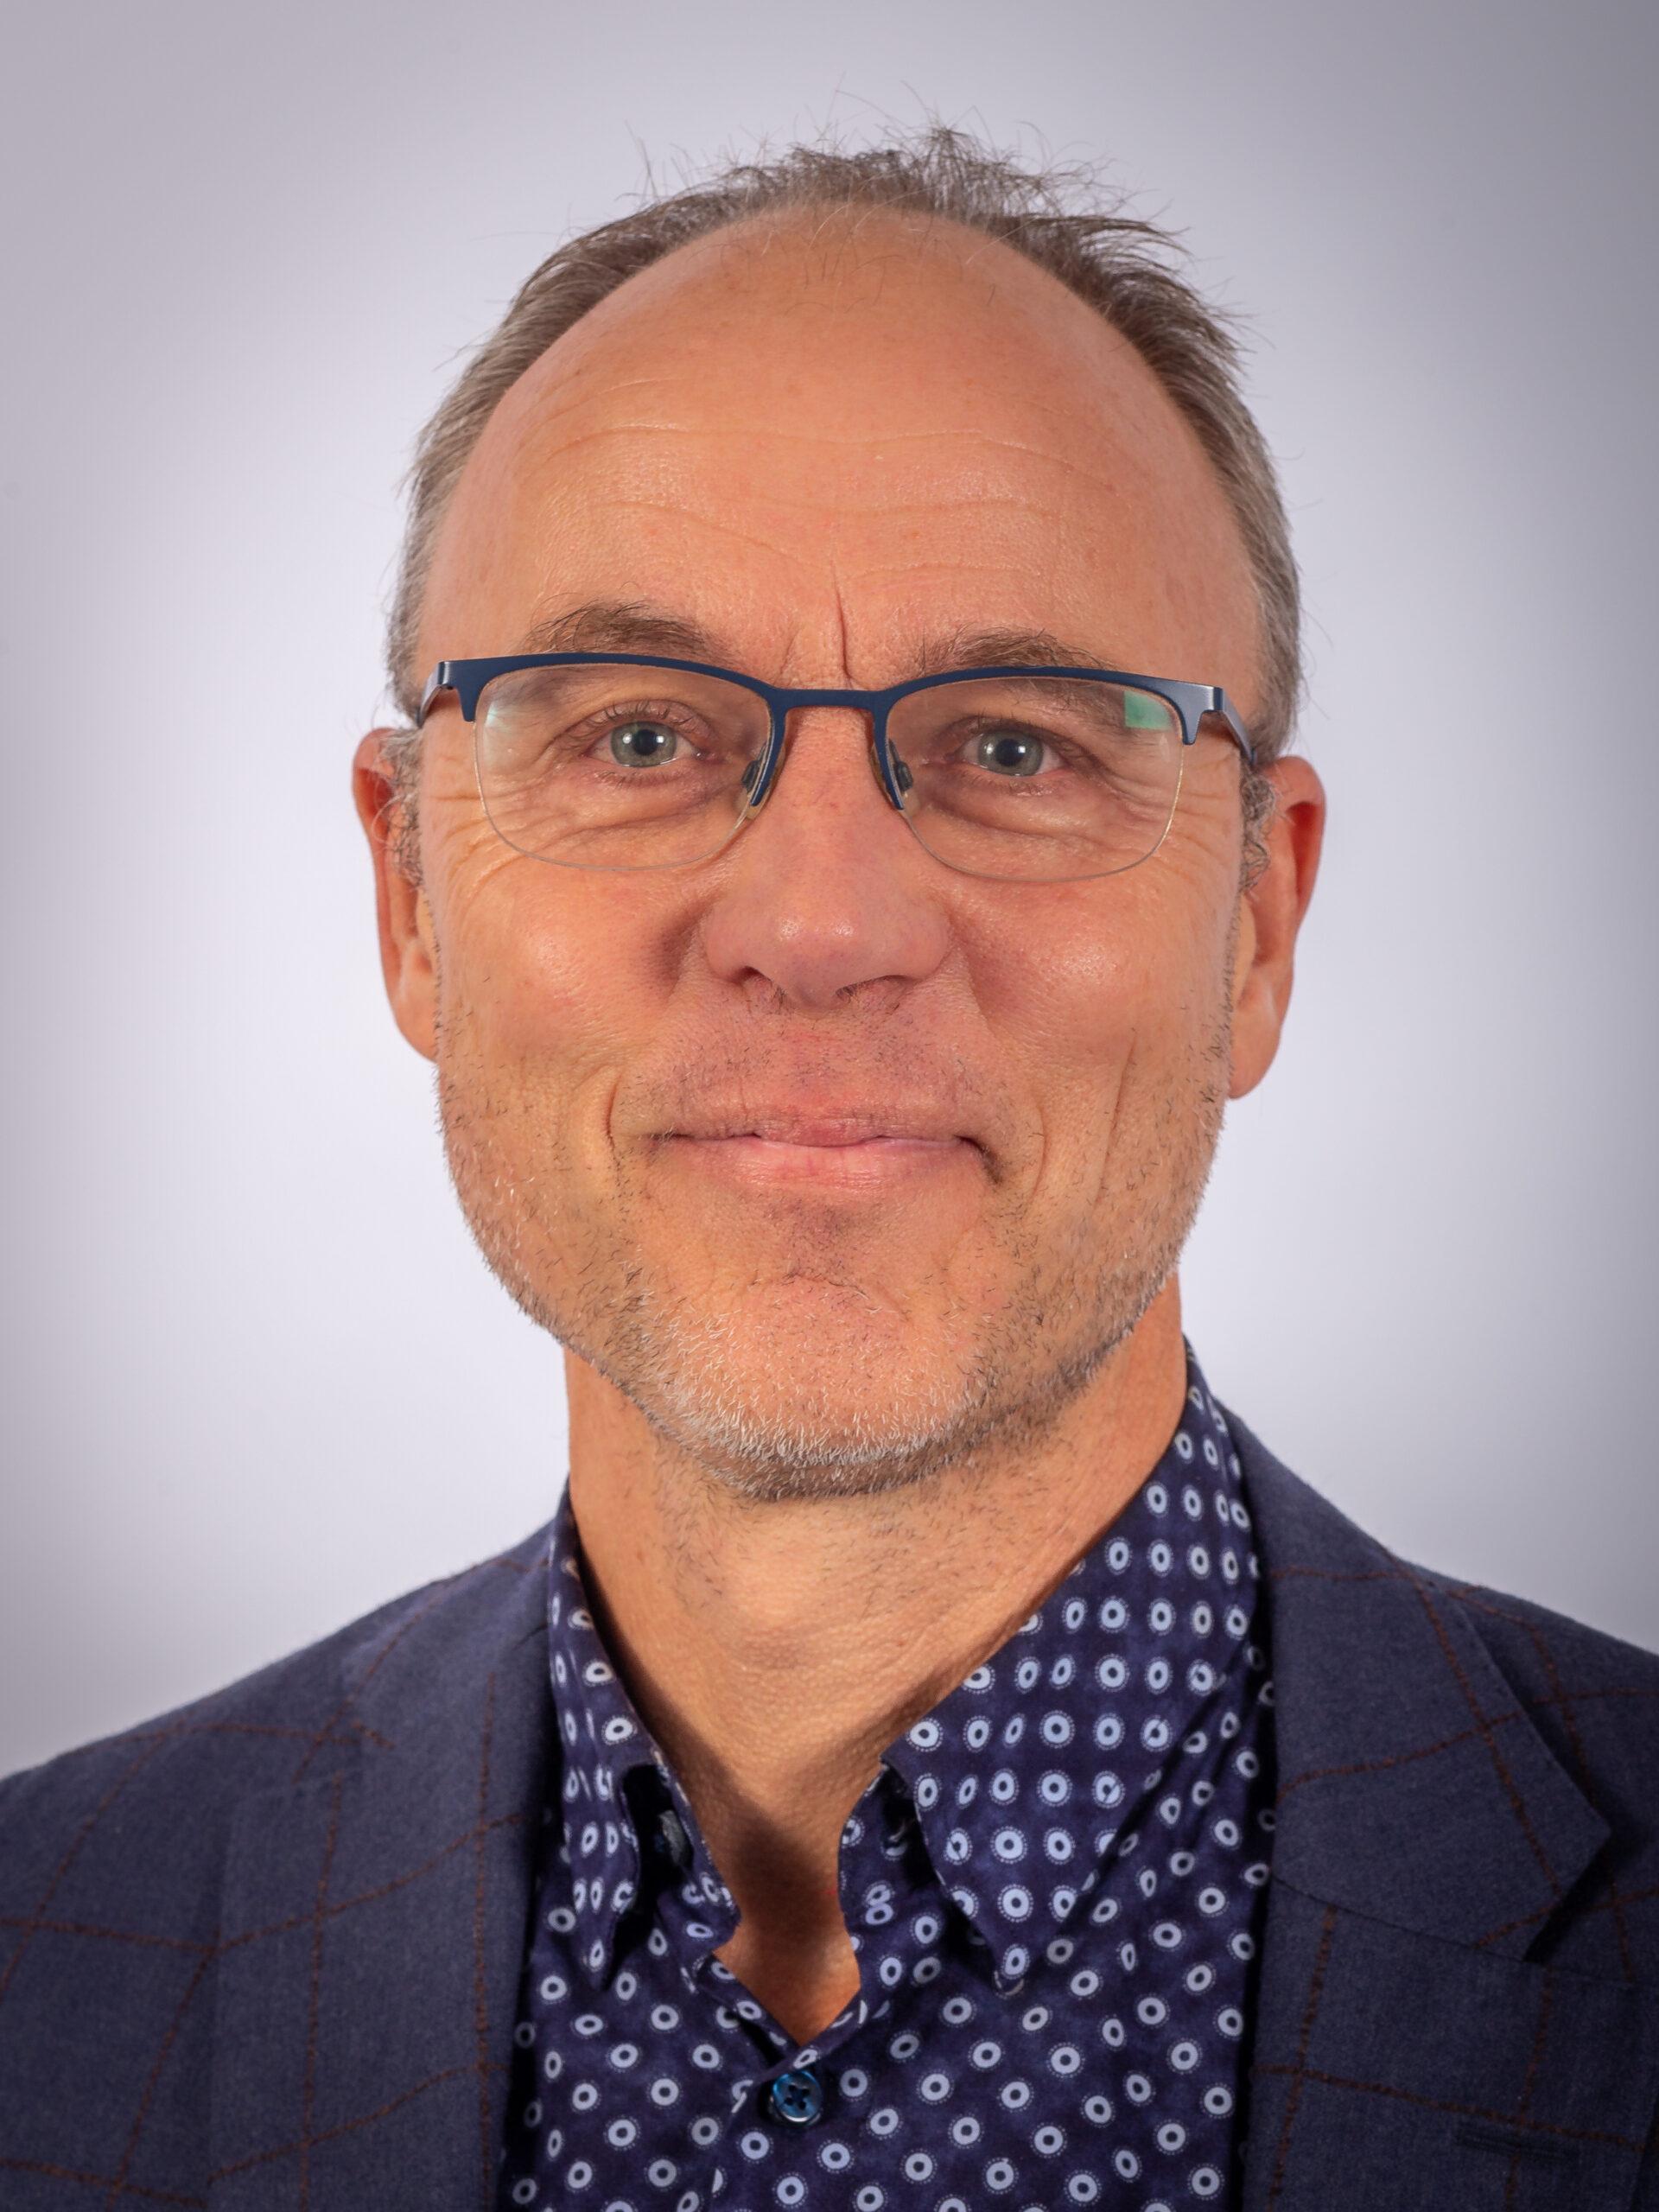 Board member Yep foundation Netherlands